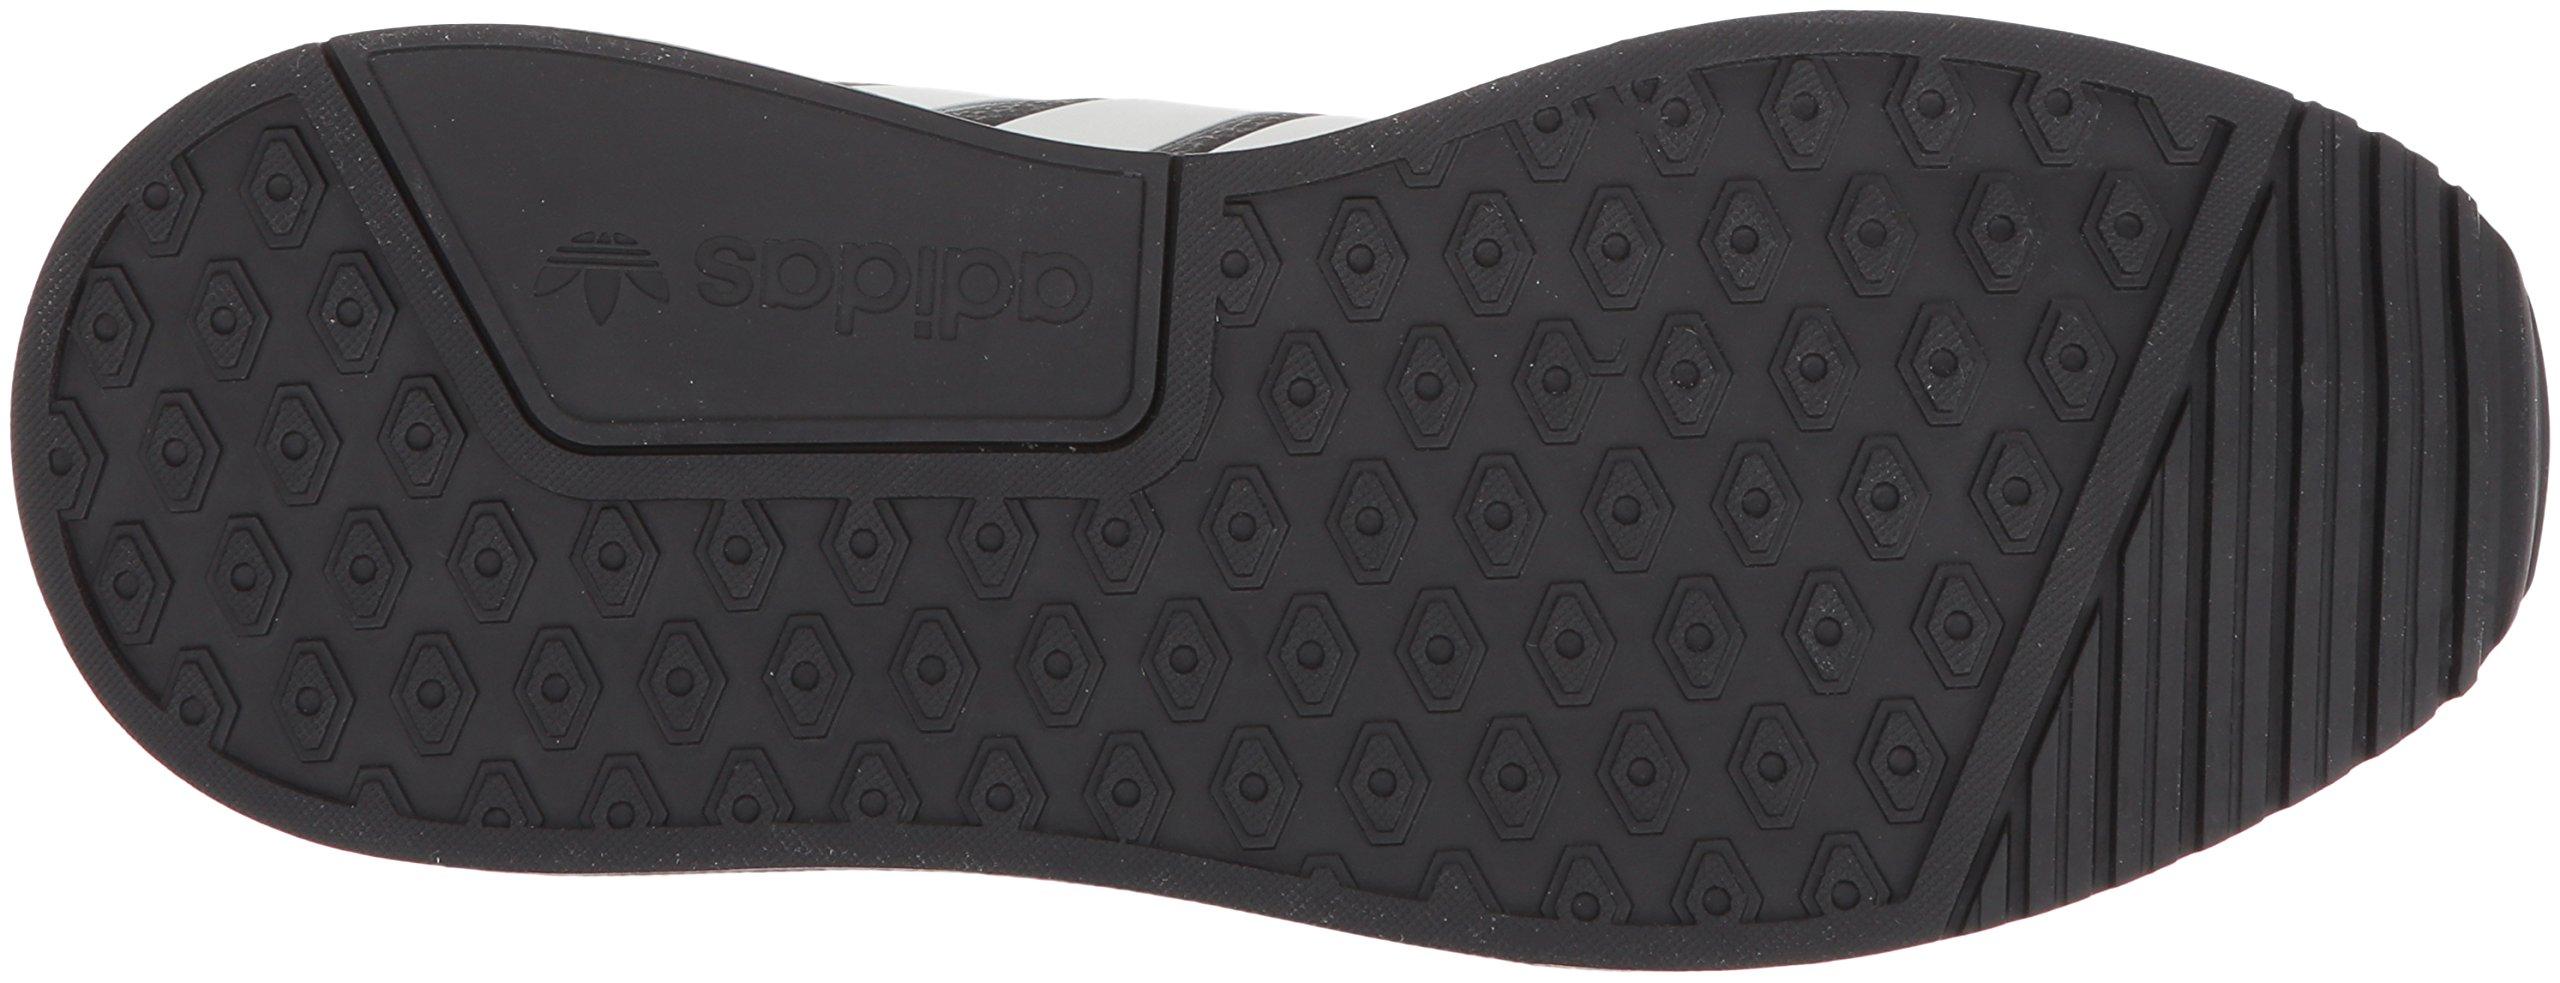 adidas Originals Mens X_PLR Running Shoe White/Black, 5 M US by adidas Originals (Image #3)